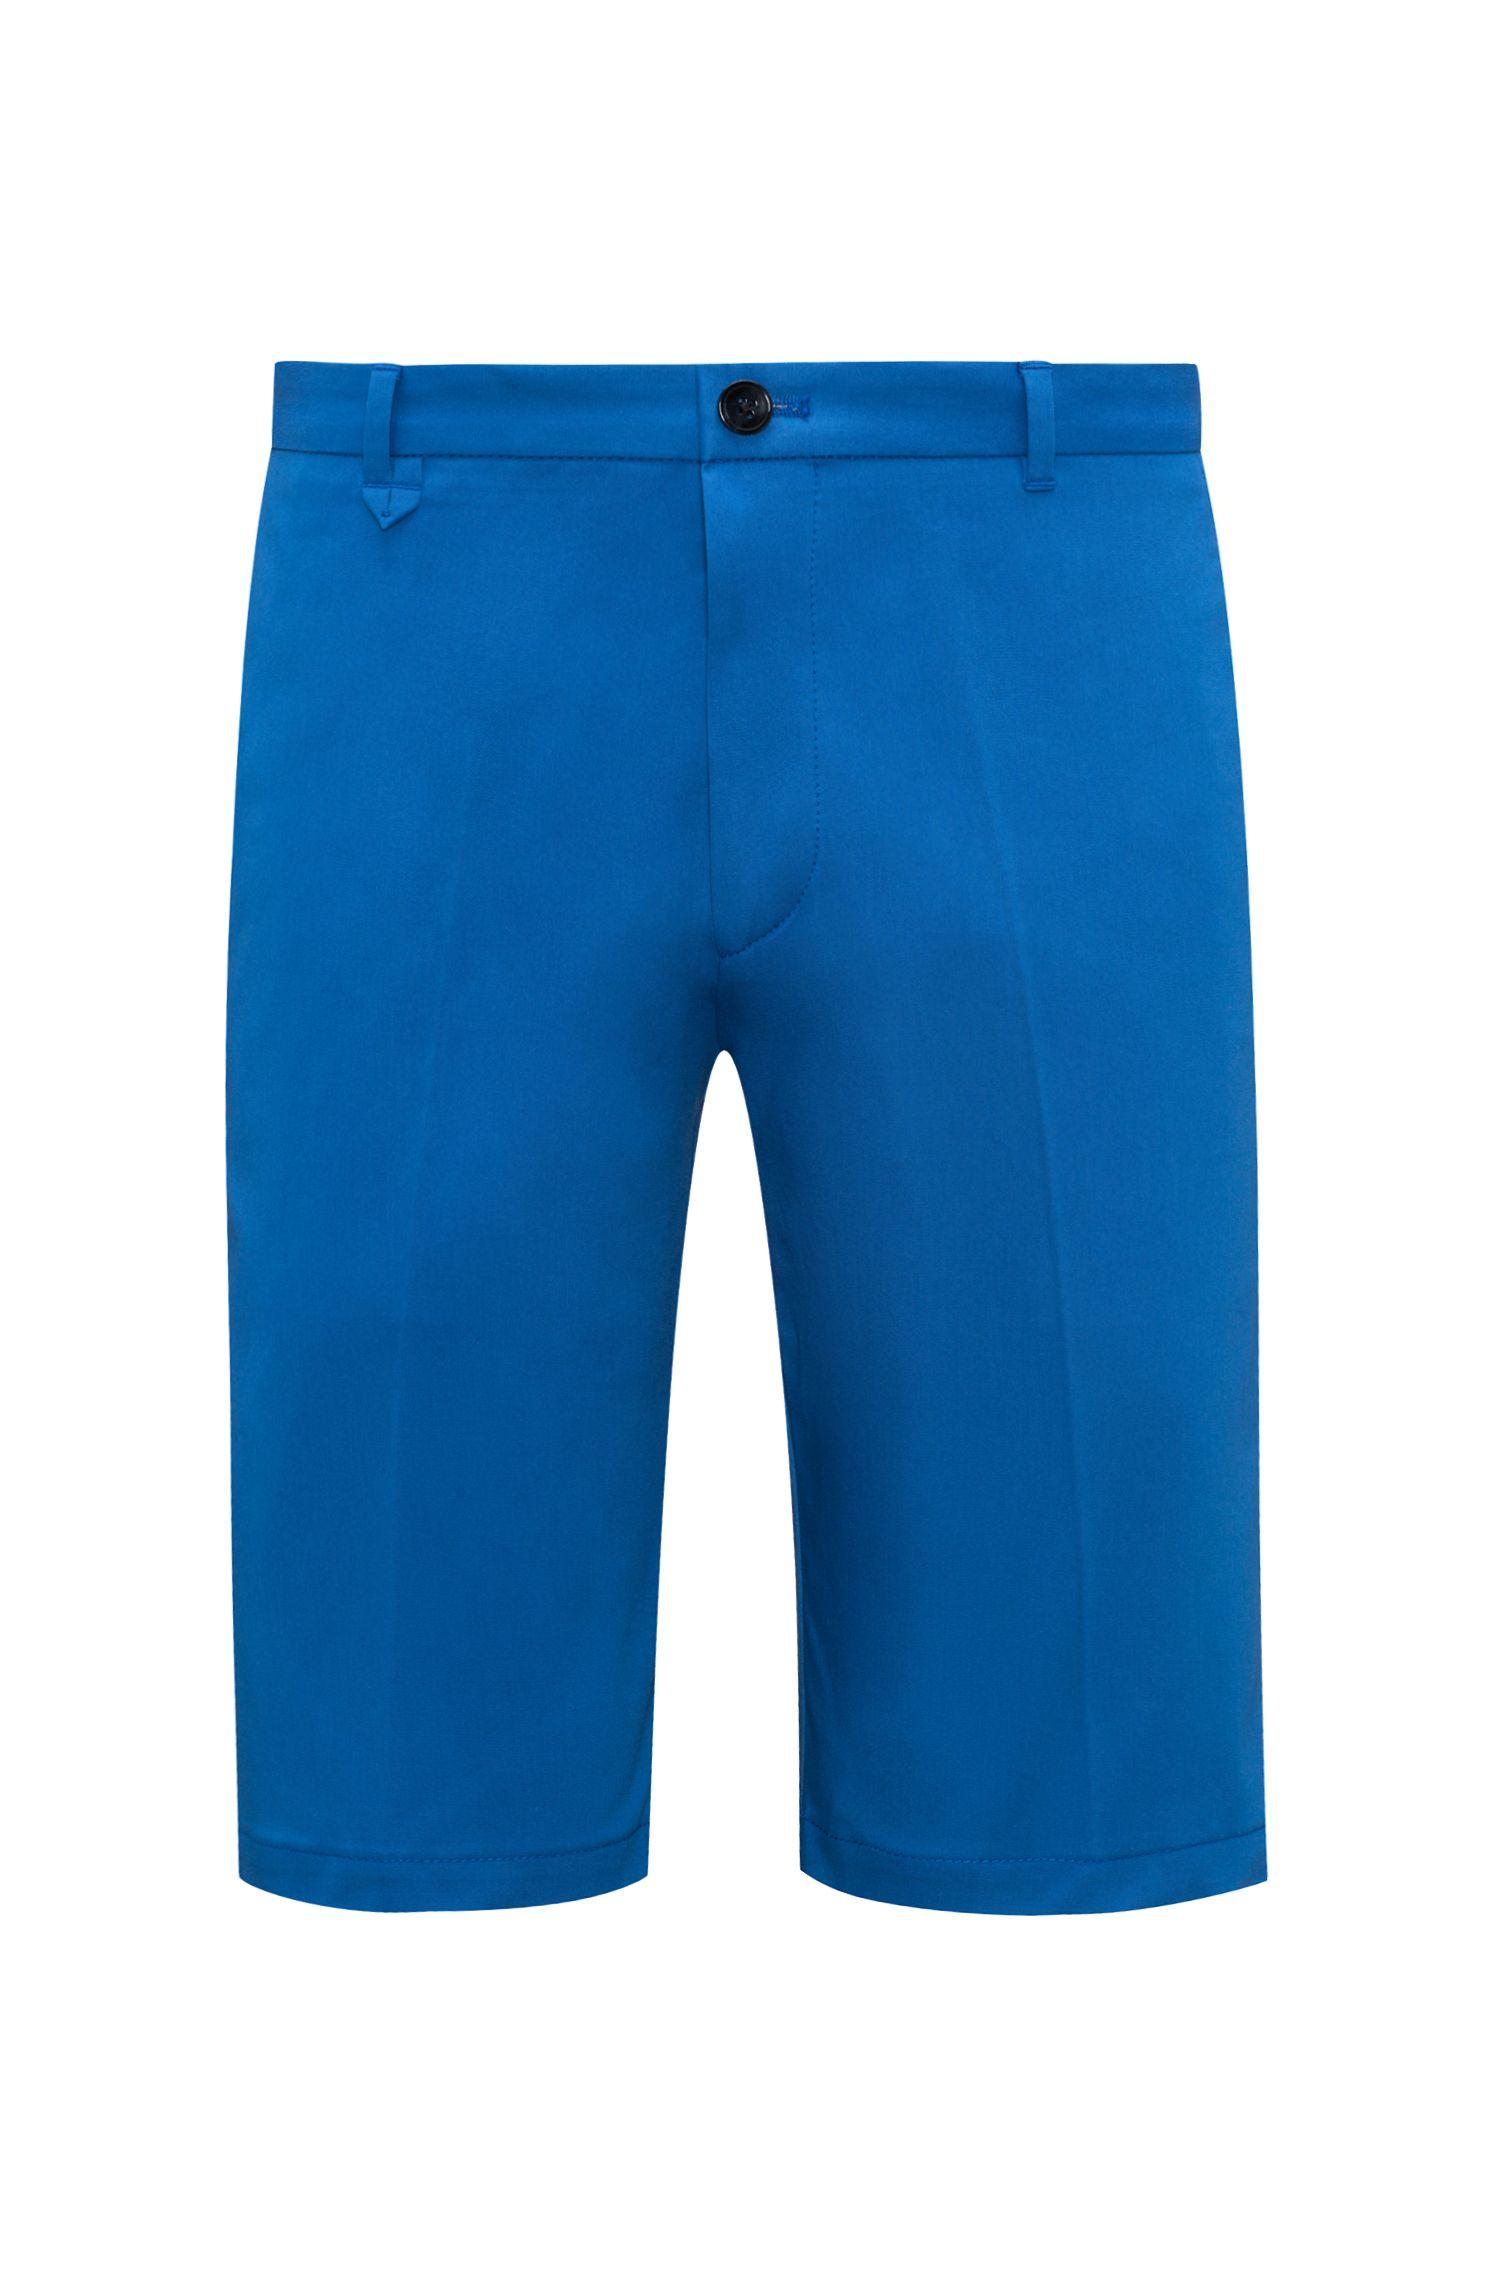 Stretch Cotton Short, Slim Fit | Hano, Open Blue